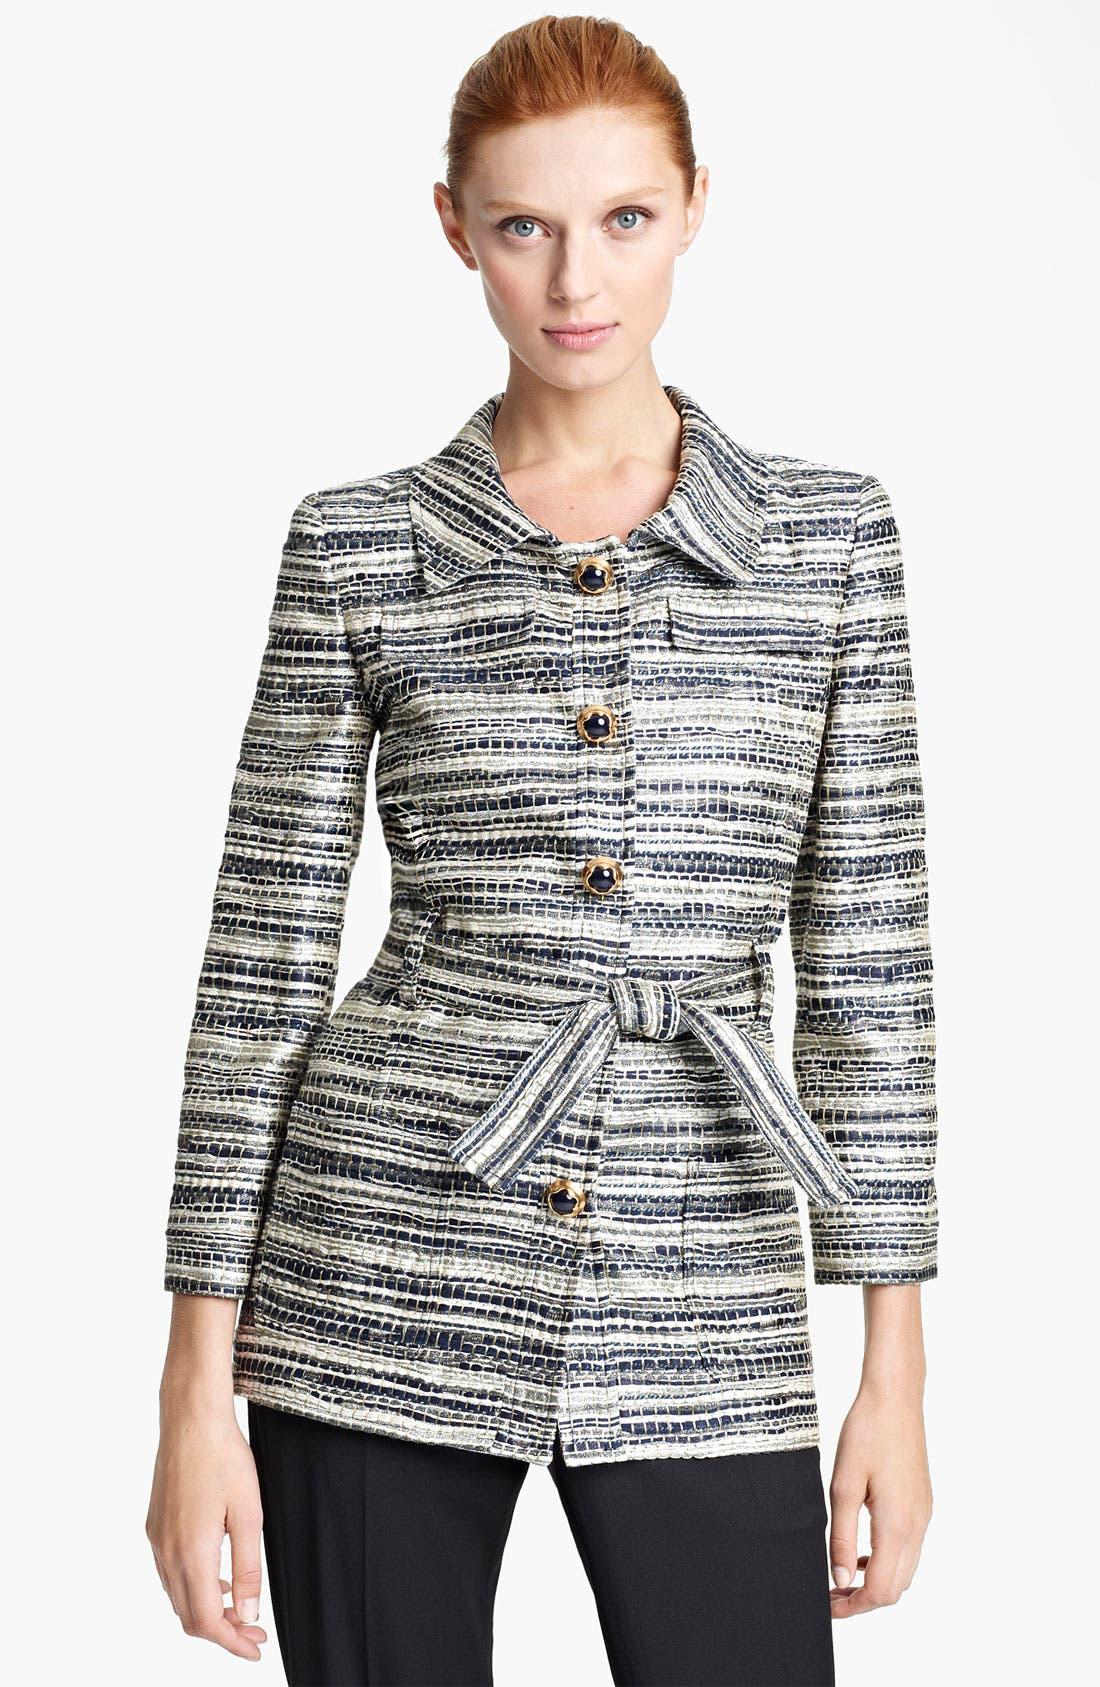 Alternate Image 1 Selected - Oscar de la Renta Belted Metallic Tweed Jacket